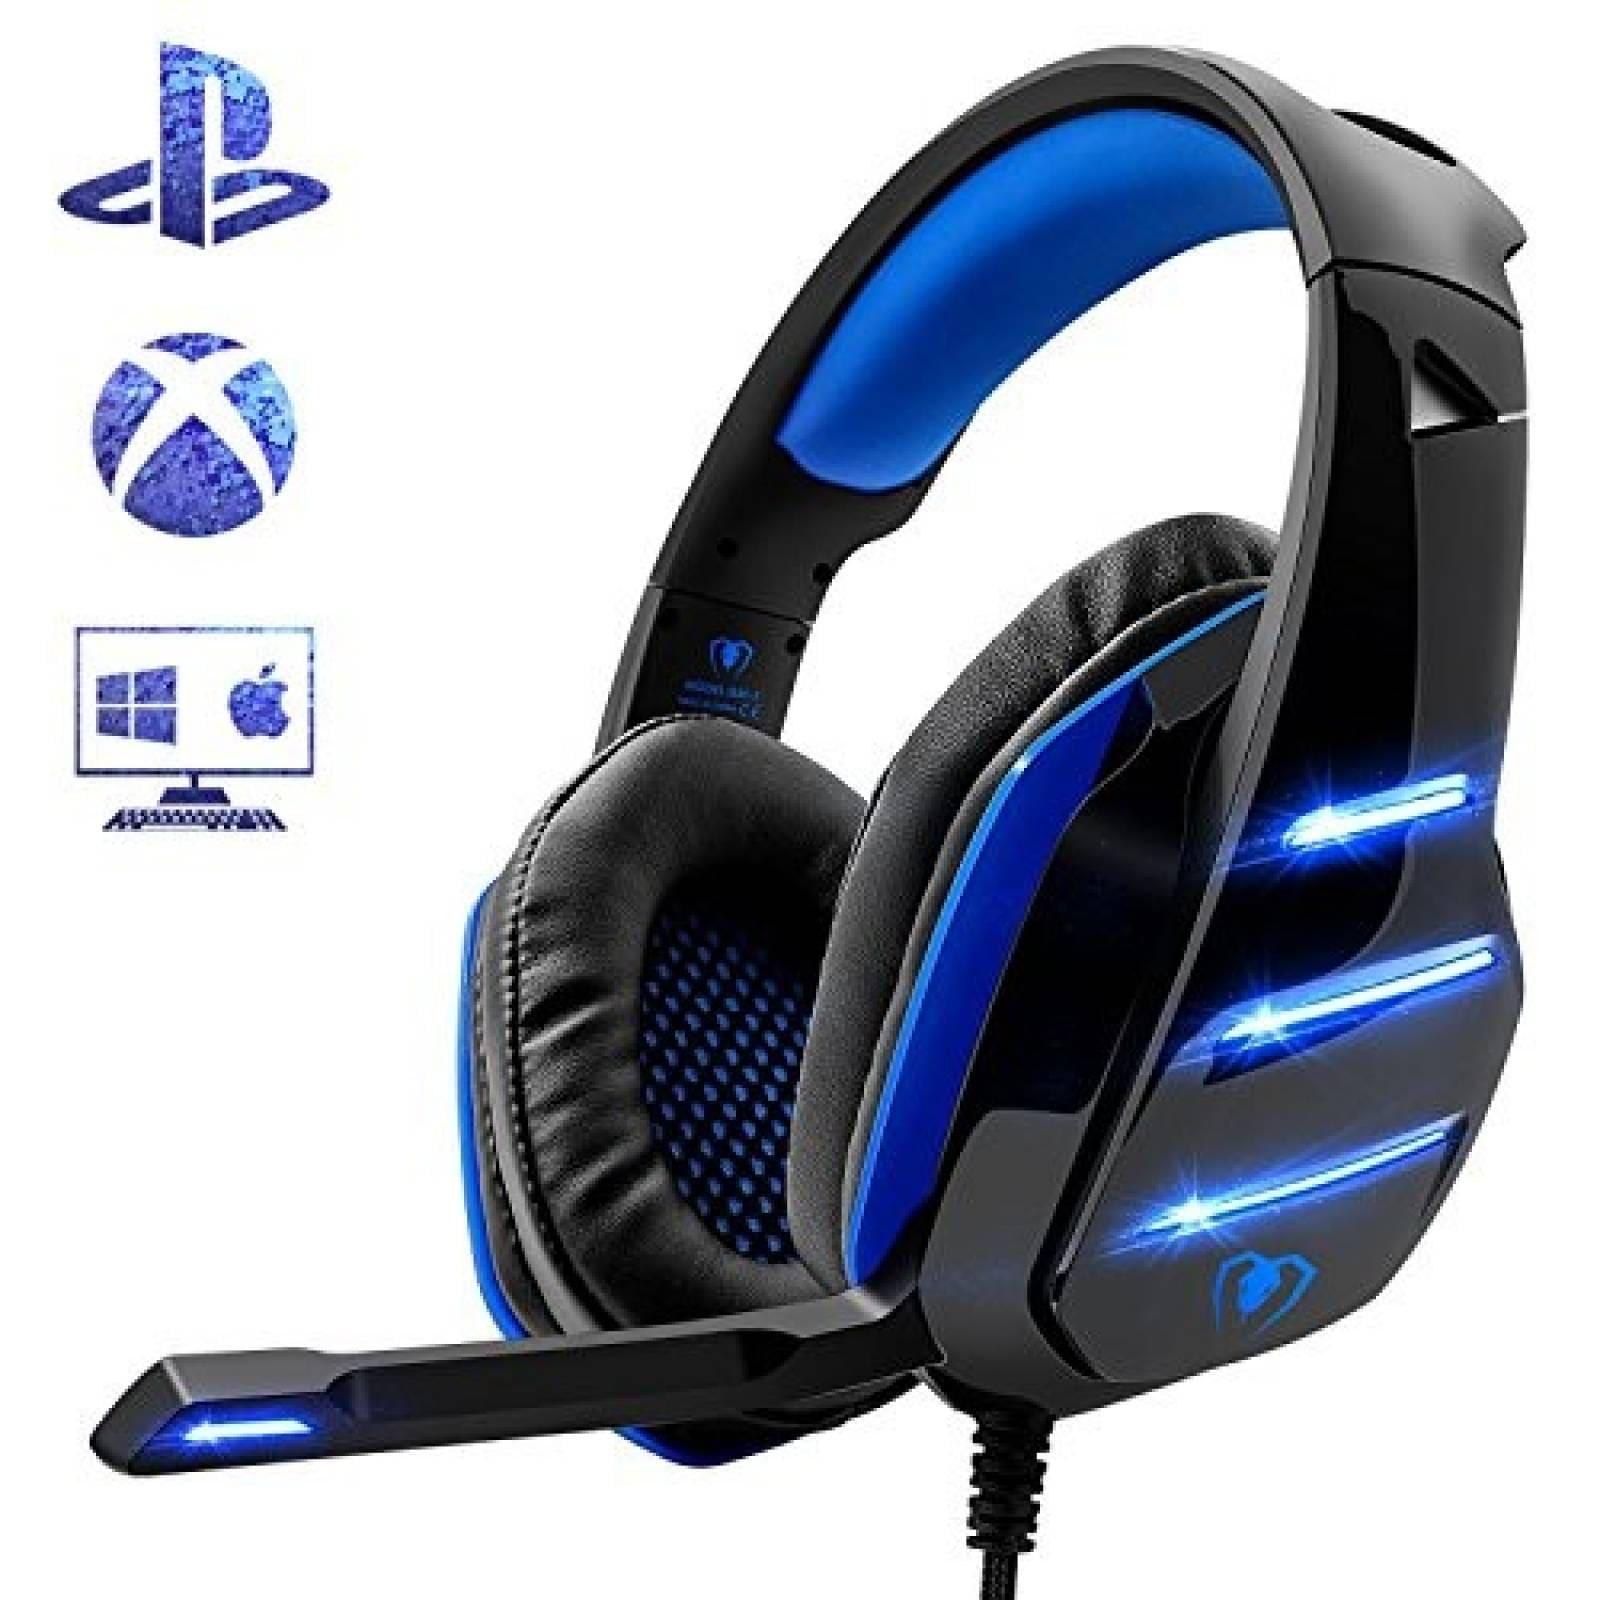 Gaming Headset Beexcellent 3.5mm luz LED con micrófono -Azul